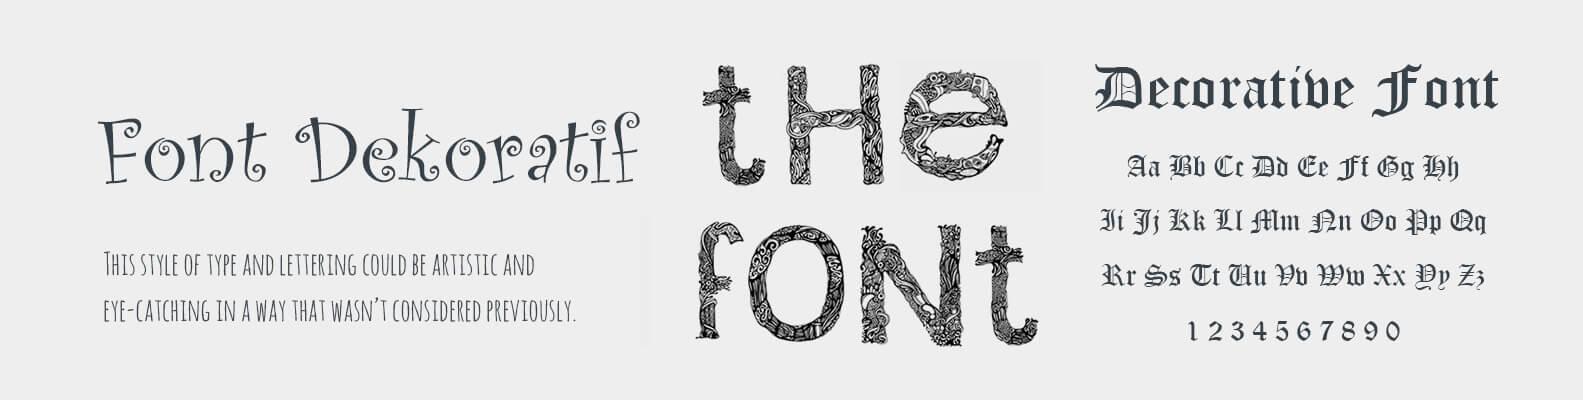 decorative-font